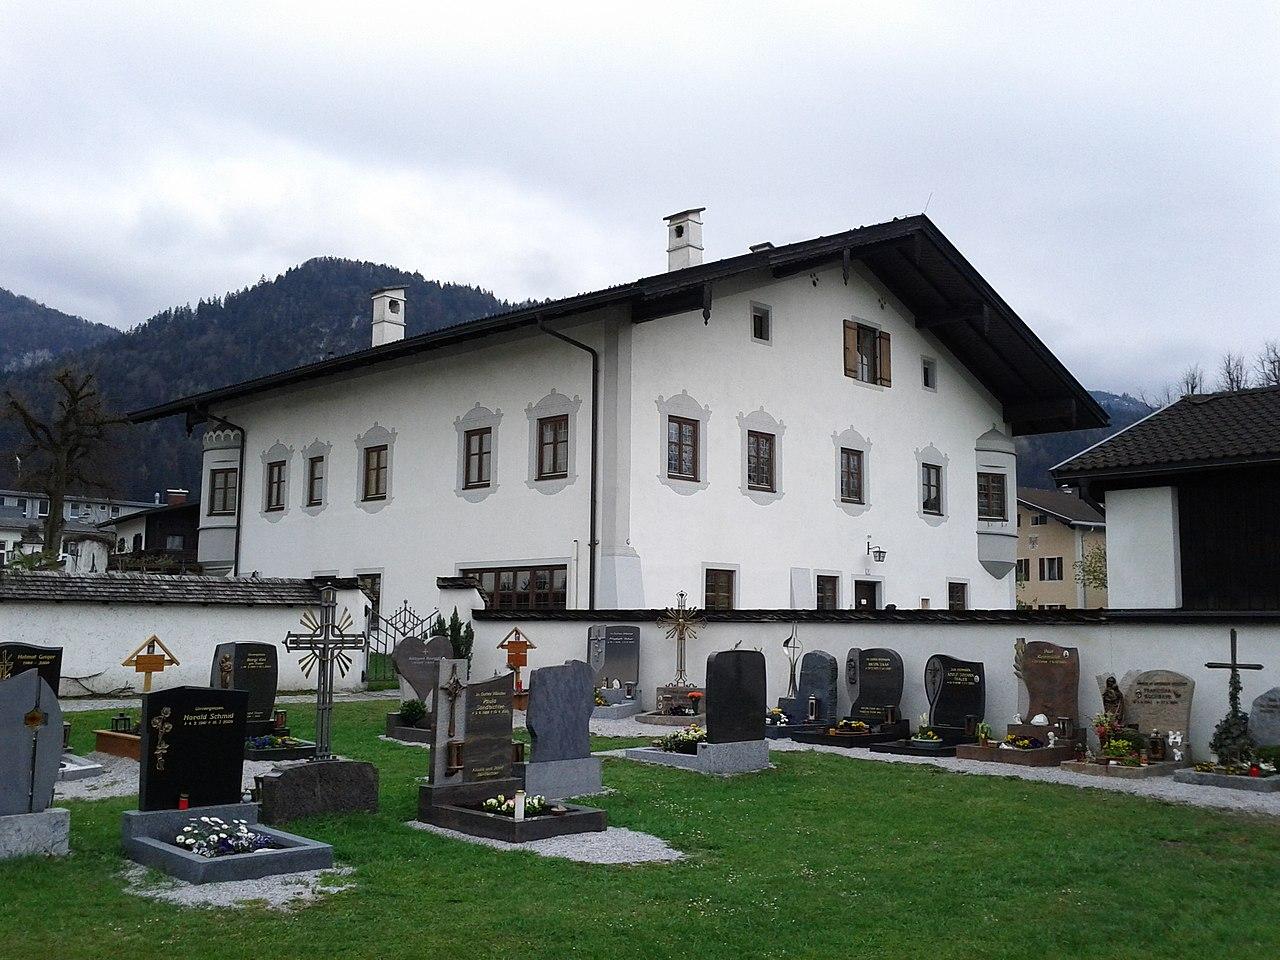 Kundl - Tirol - mysalenow.com